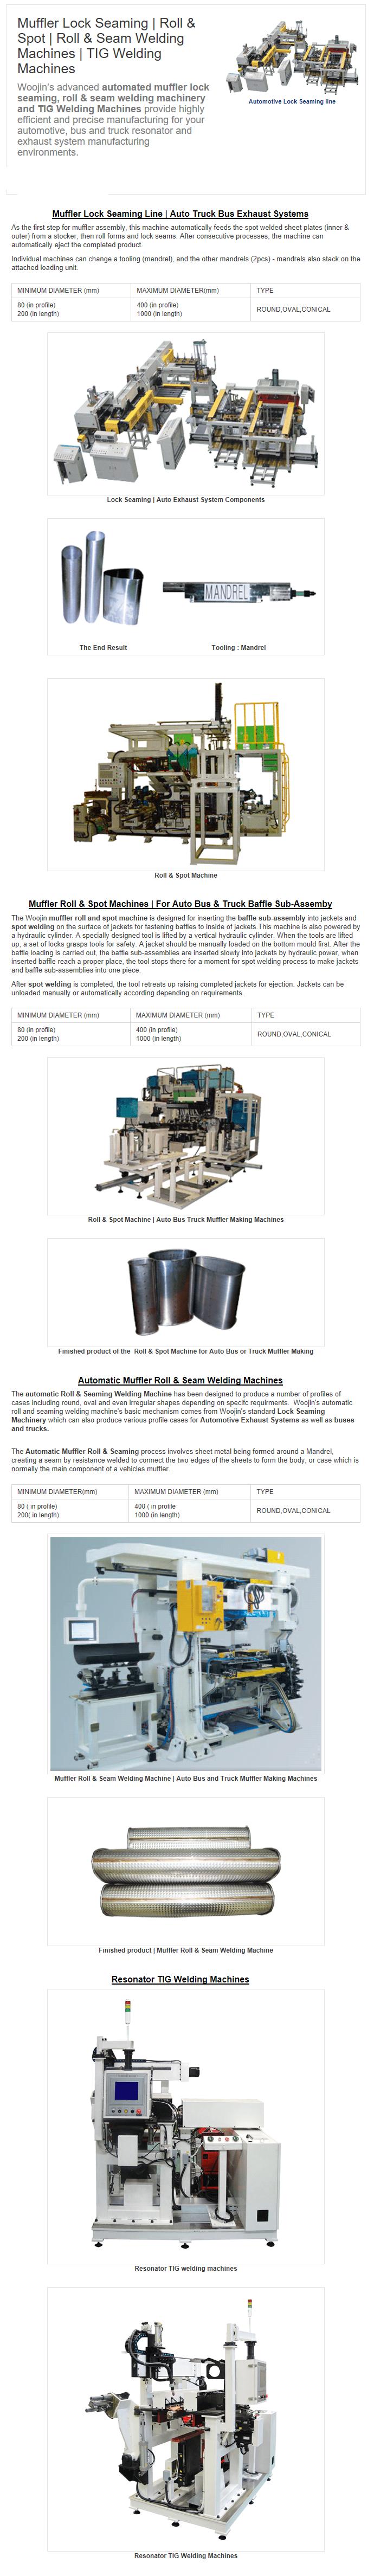 Woojin Engineering Lock Seaming / Roll & Spot / Roll & Seam Welding Machines / TIG Welding Machines